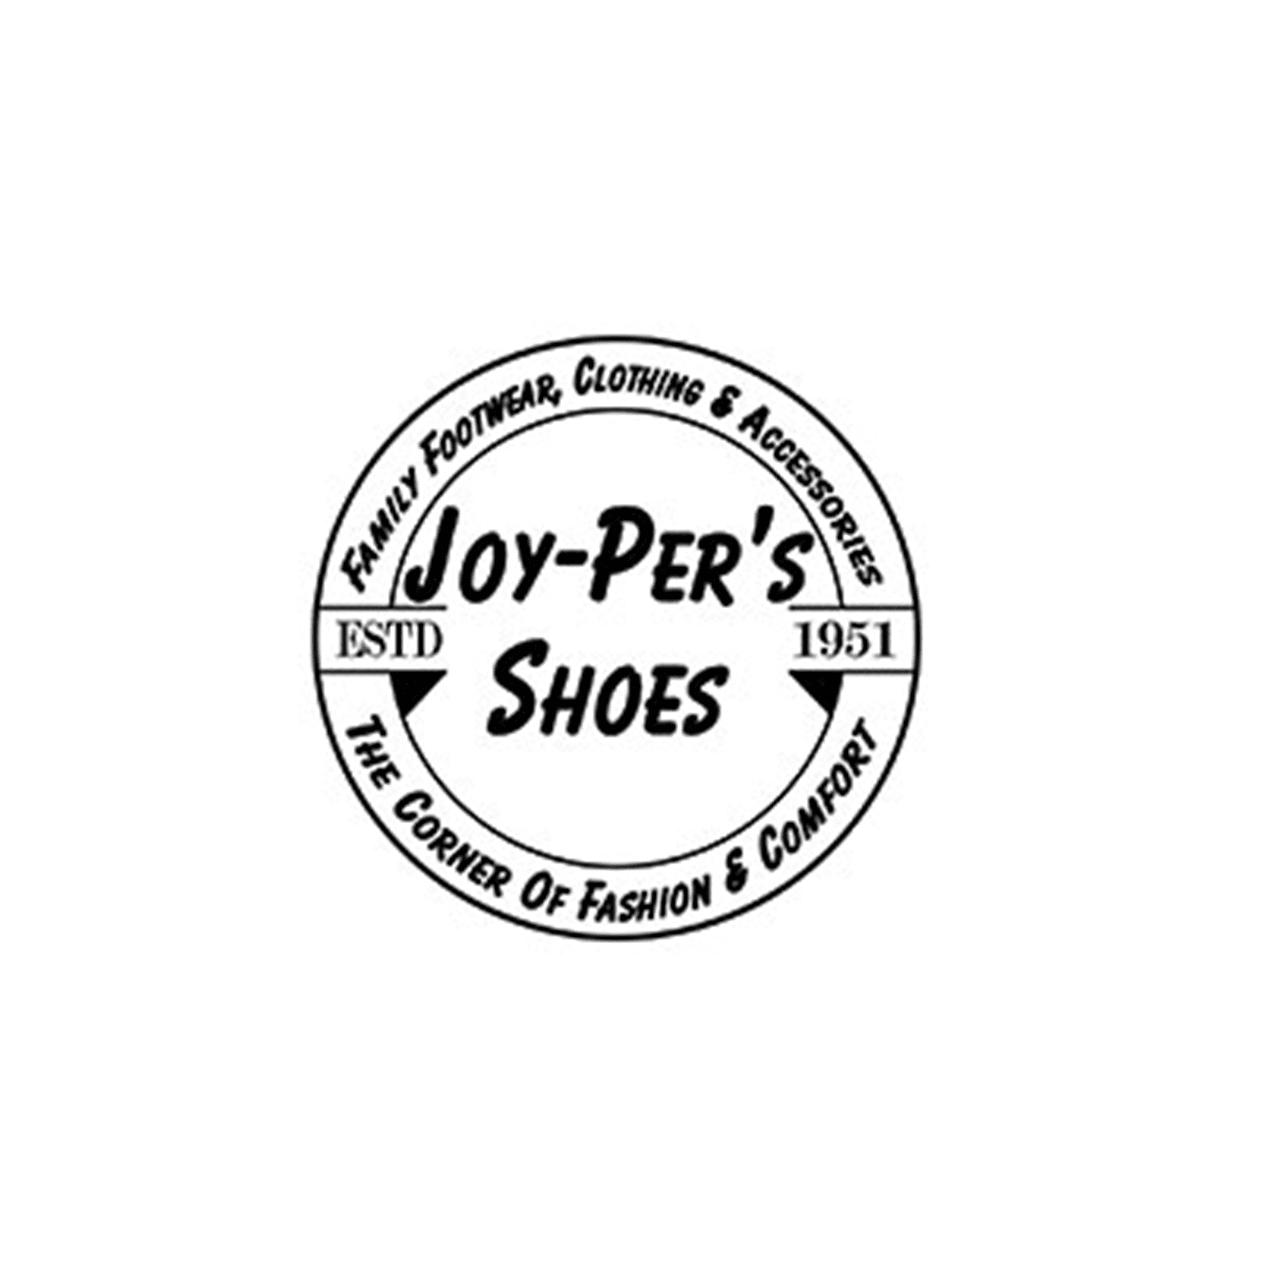 Joy-Per's Shoes - Salinas, CA - Apparel Stores